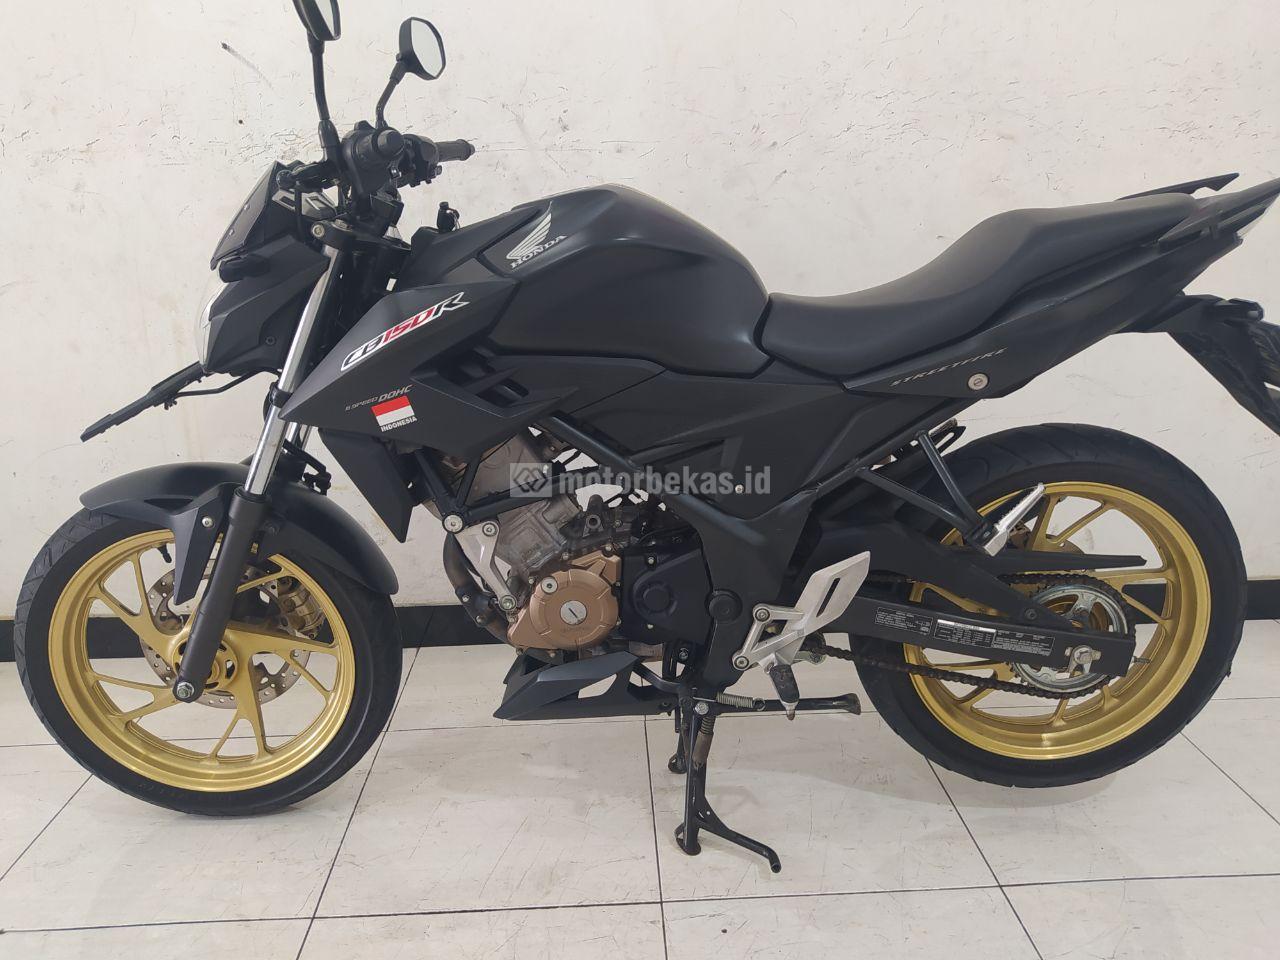 HONDA NEW CB150R SE  2121 motorbekas.id